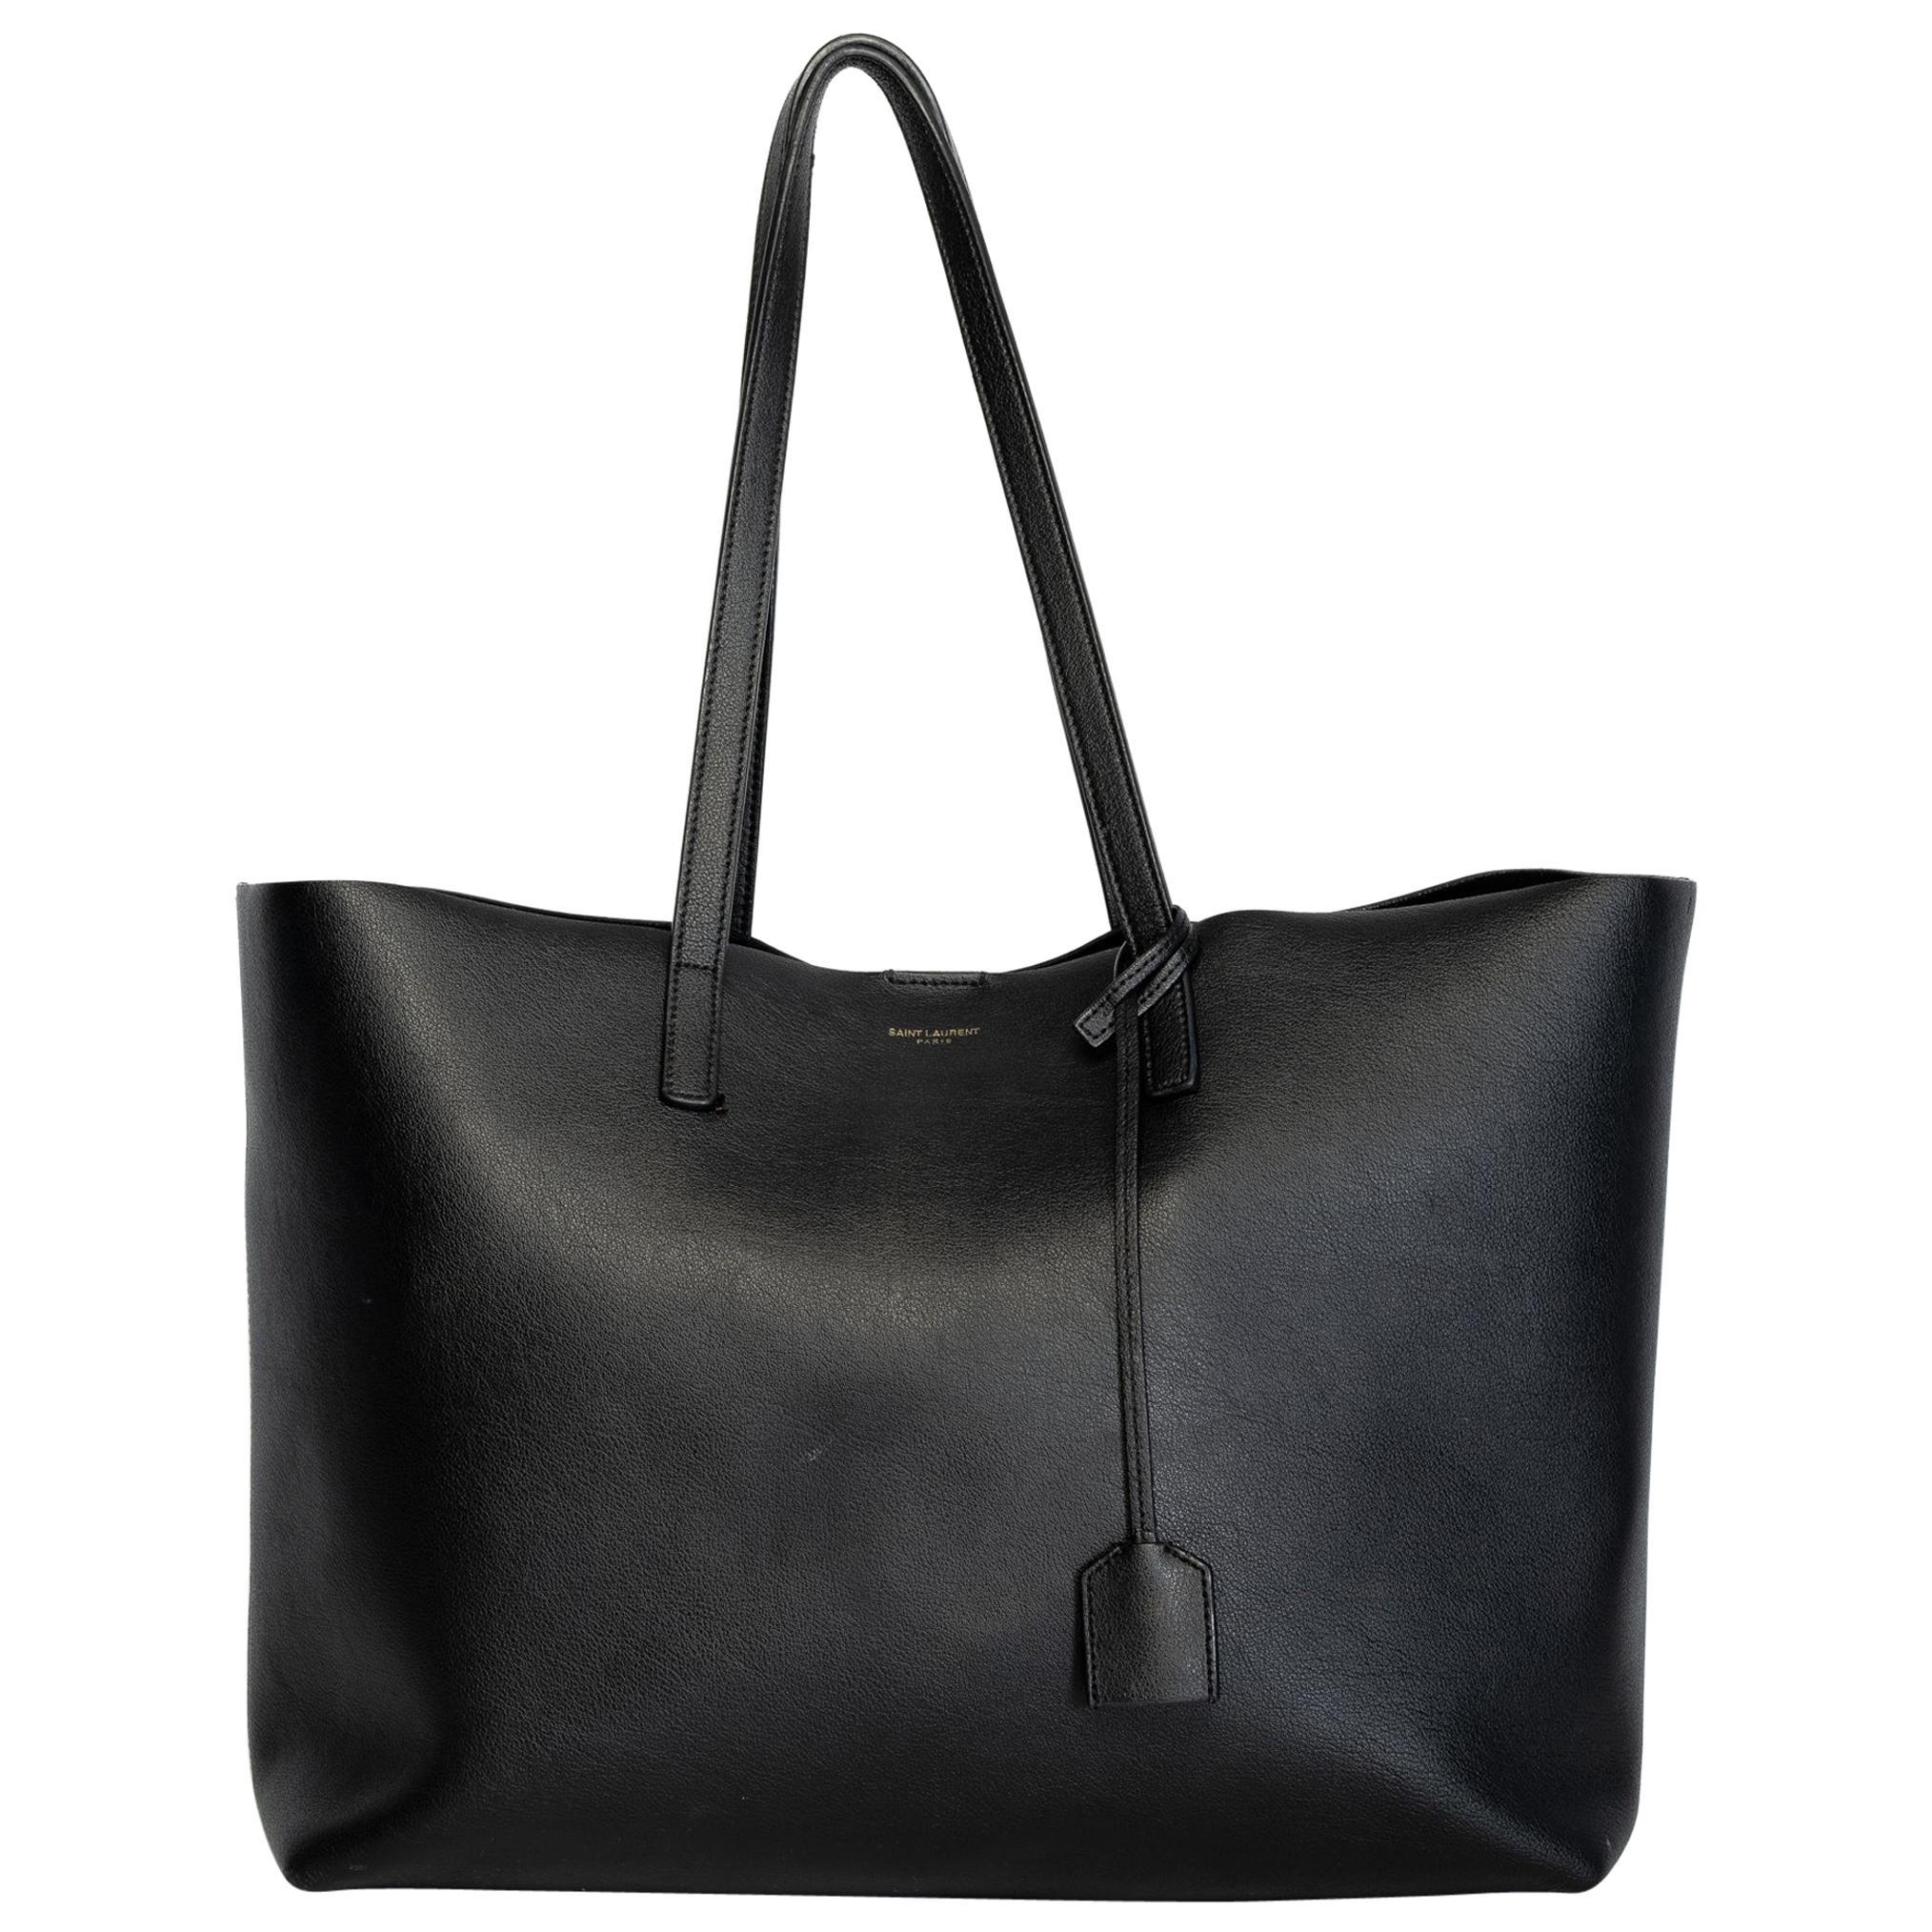 Saint Laurent Shopping Black Leather Tote